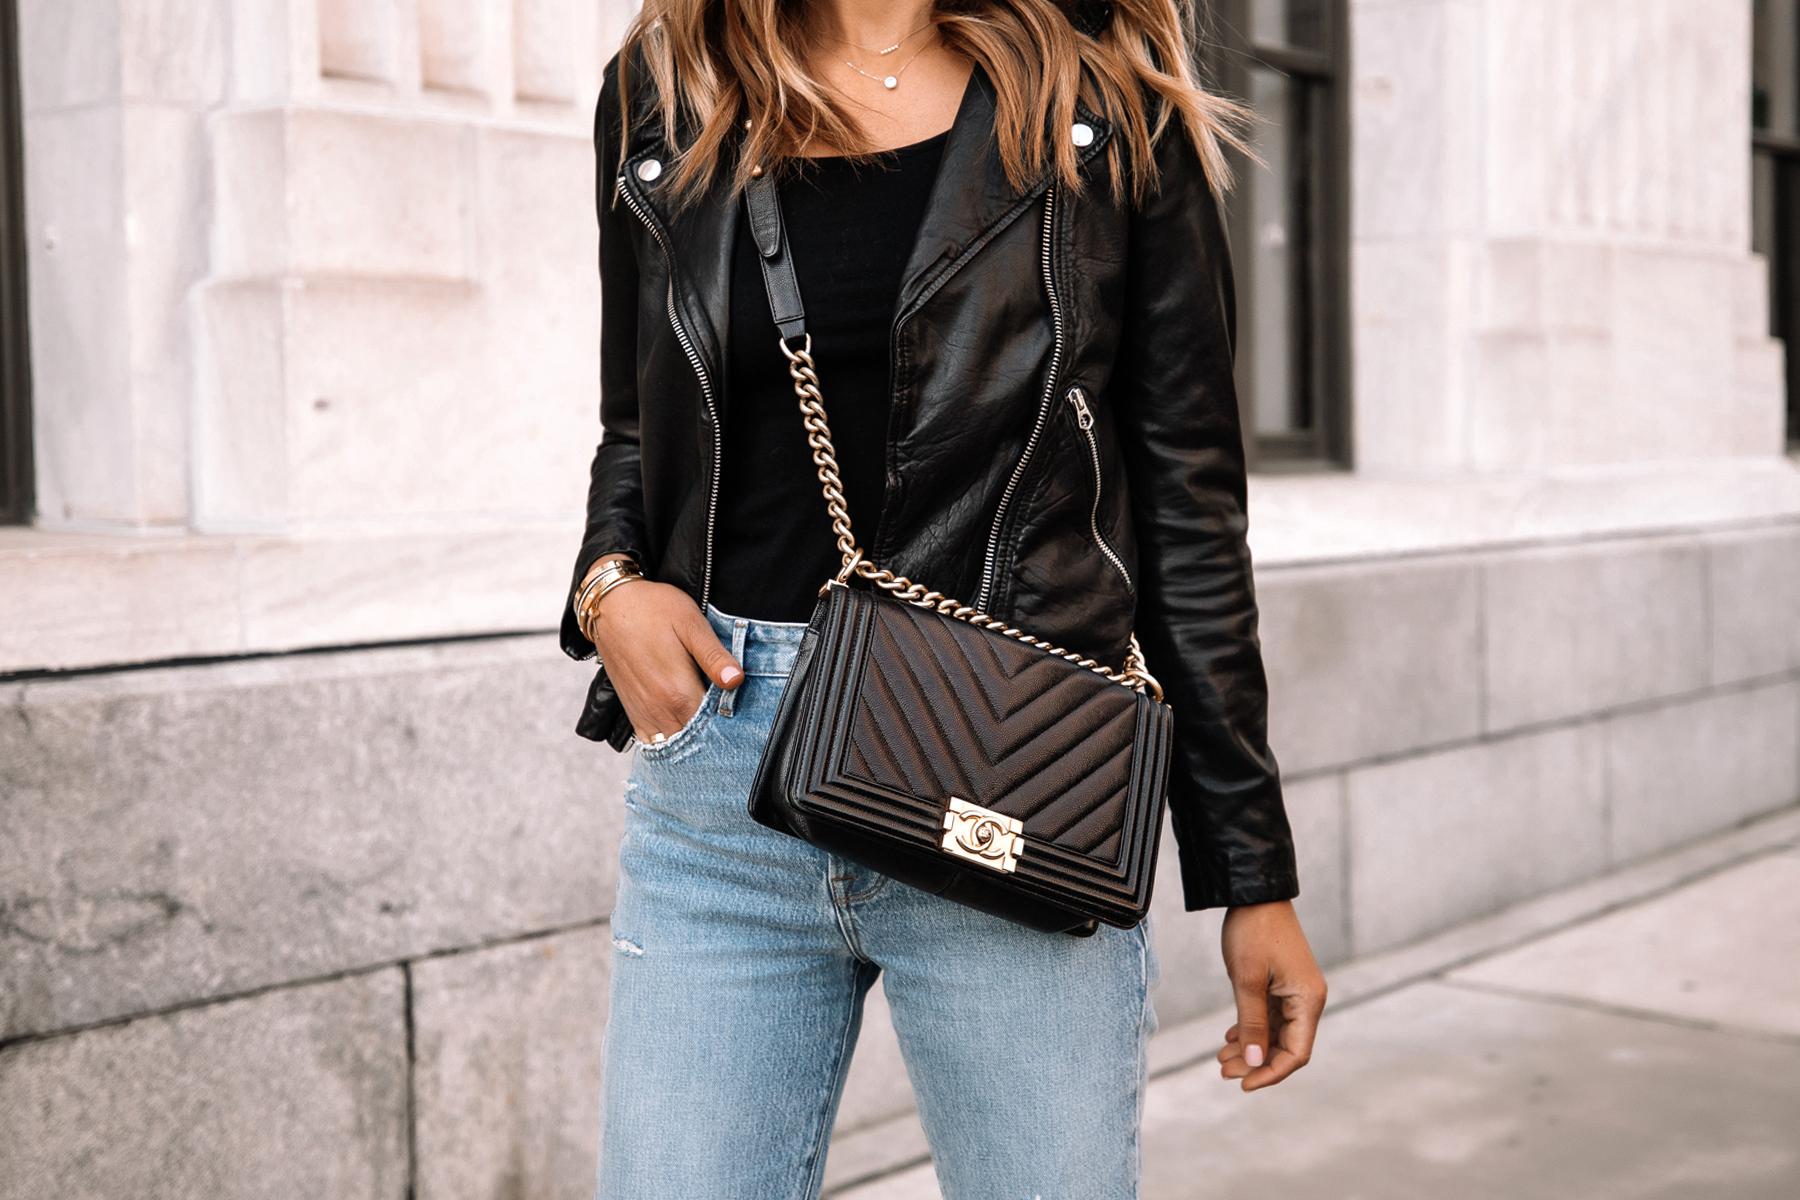 Fashion Jackson Wearing Madewell Black Leather Jacket Denim Jeans Chanel Black Boy Bag